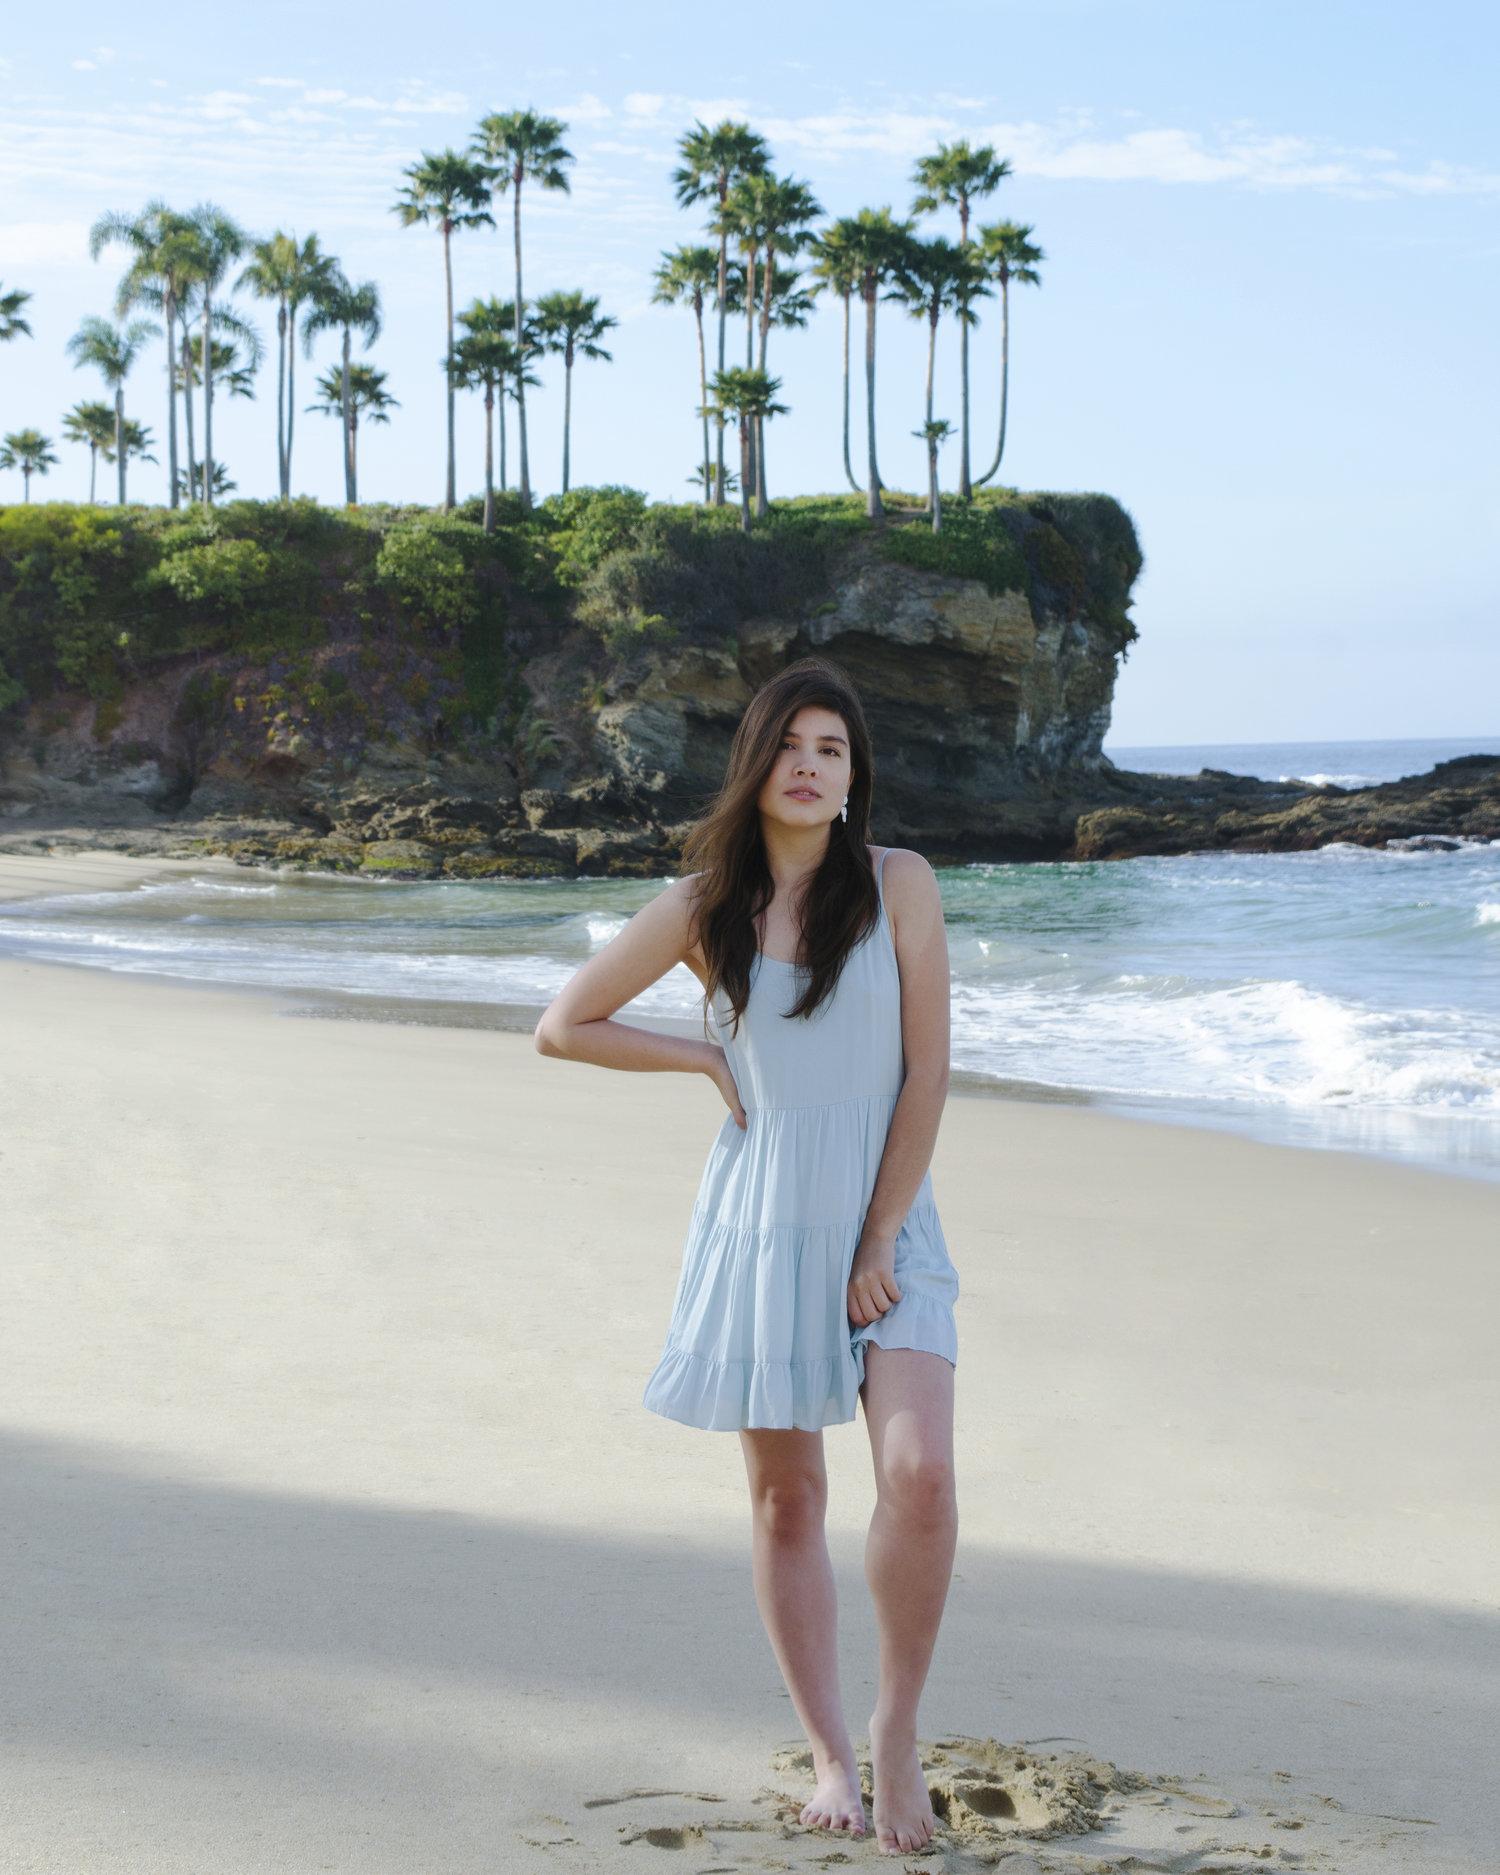 With Chelle Laguna Beach